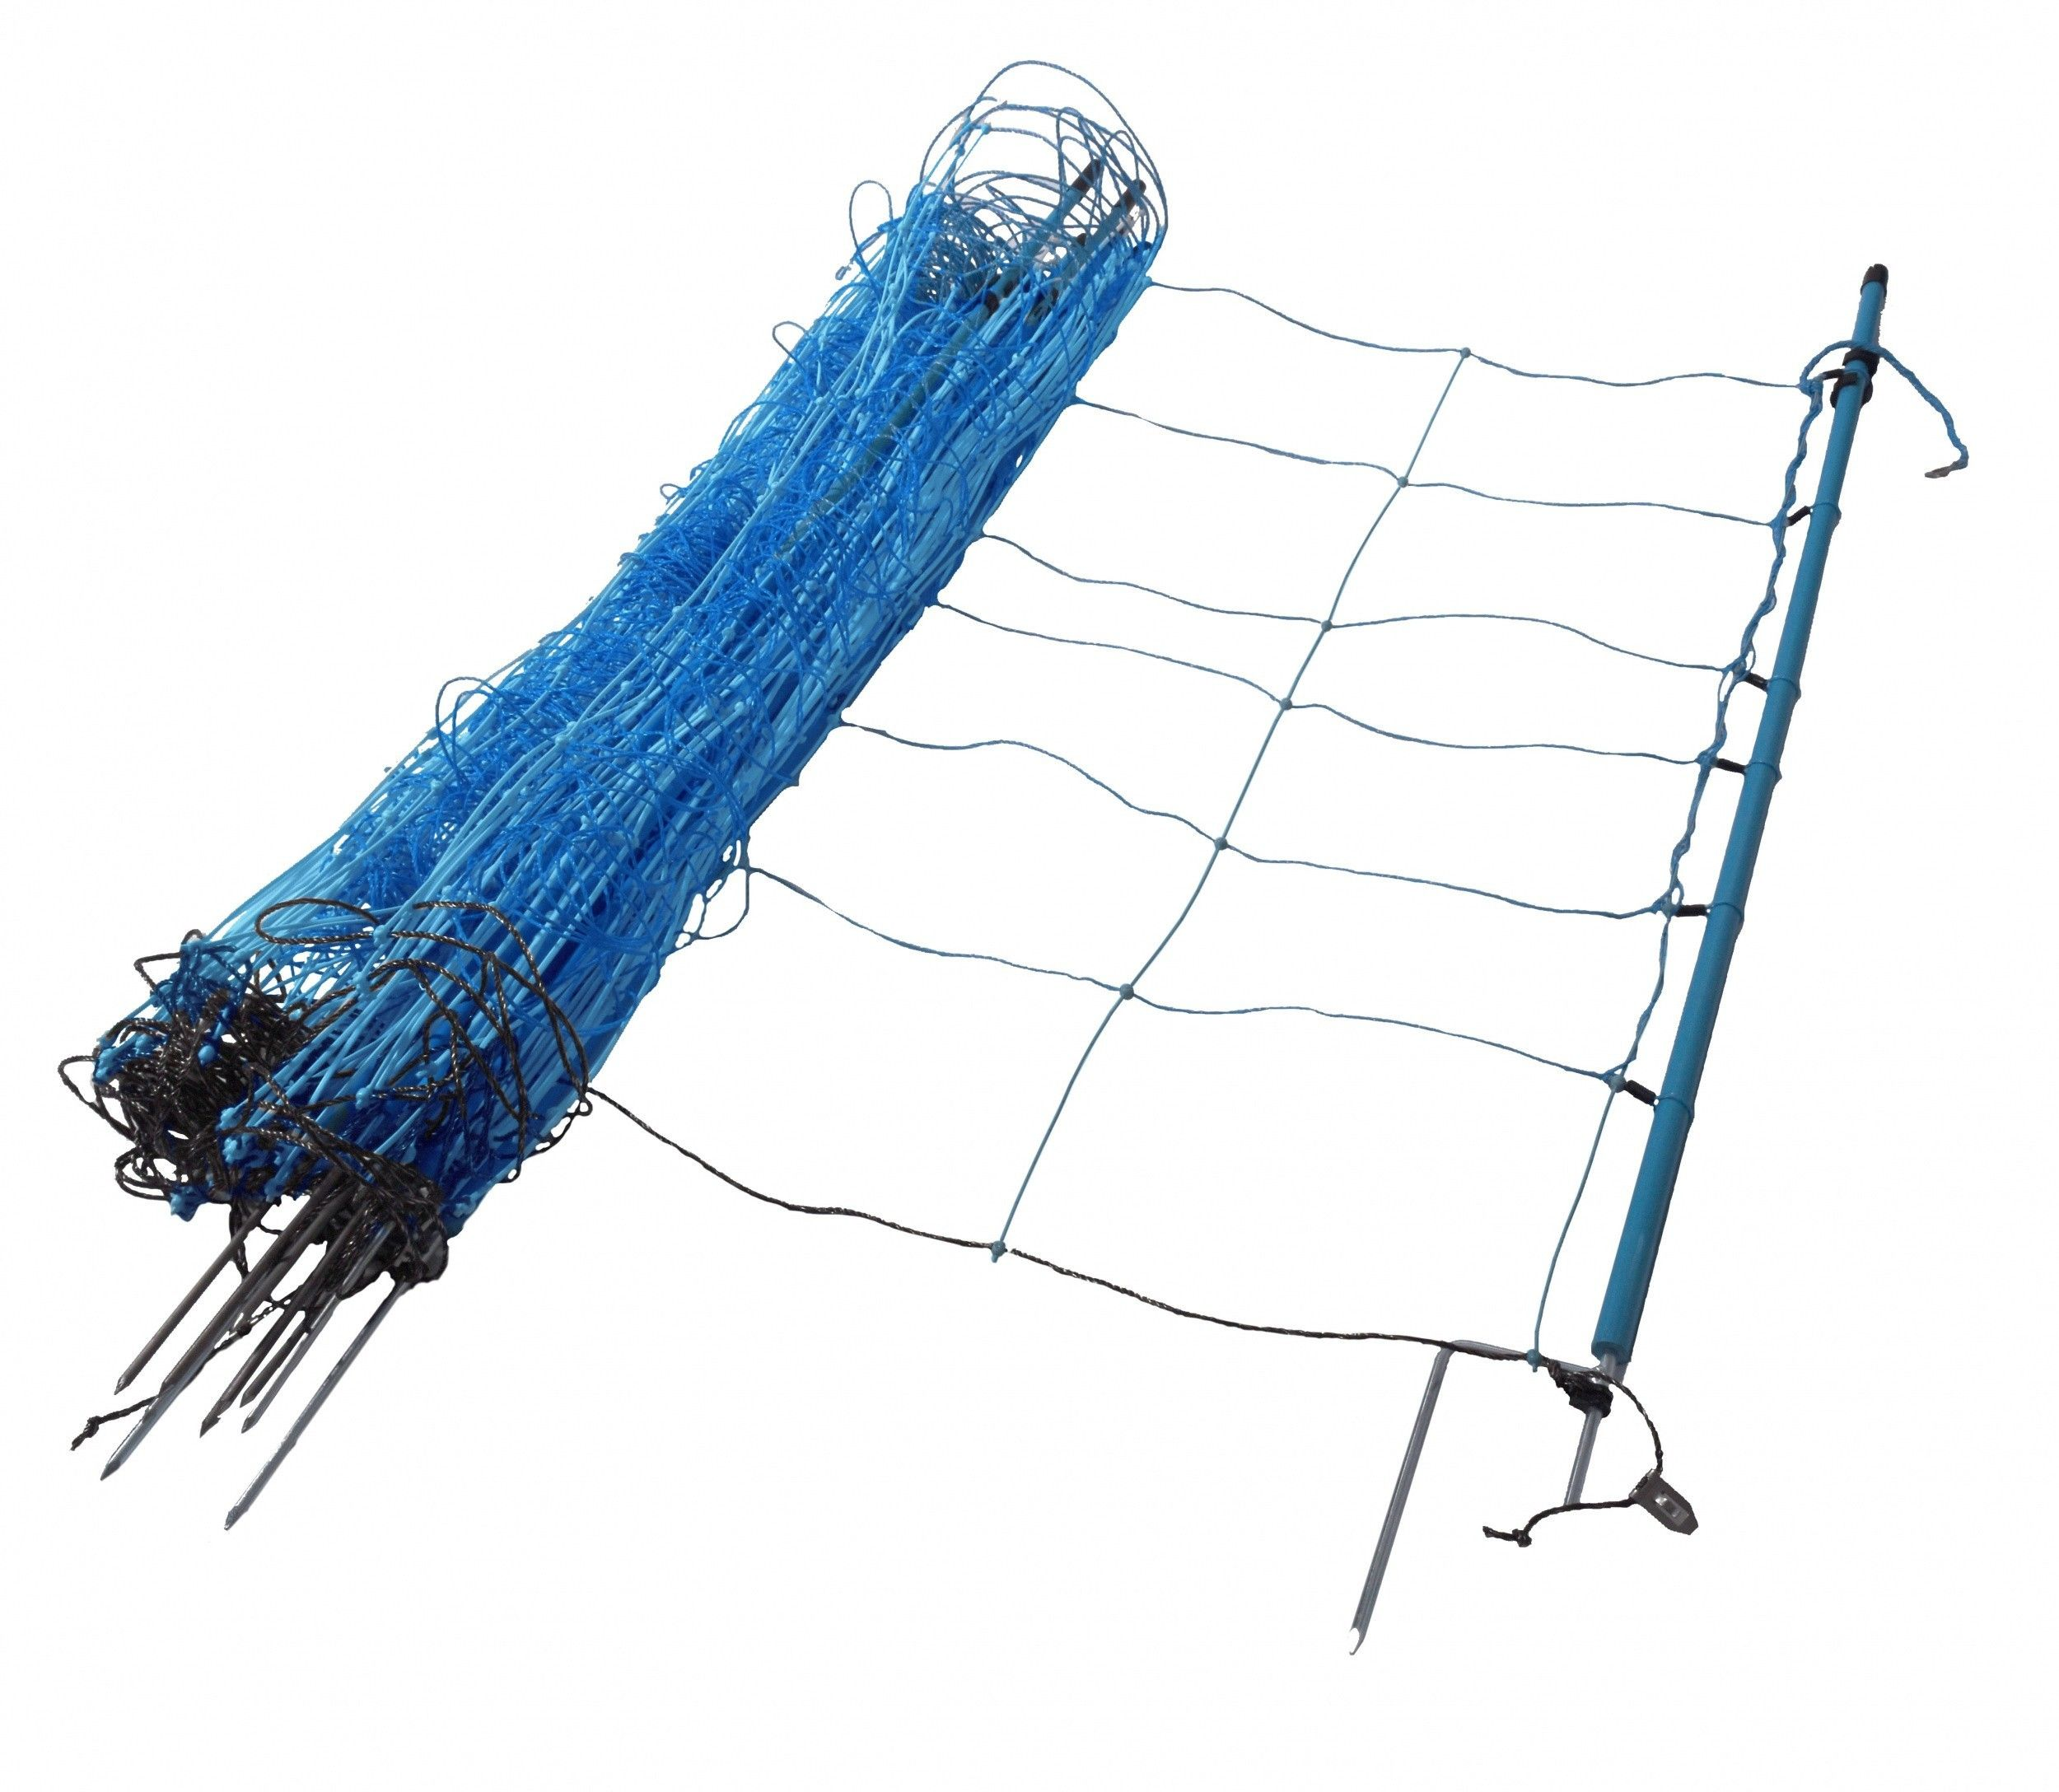 Wolvennet Gallagher blauw 120cm hoog x 50mtr